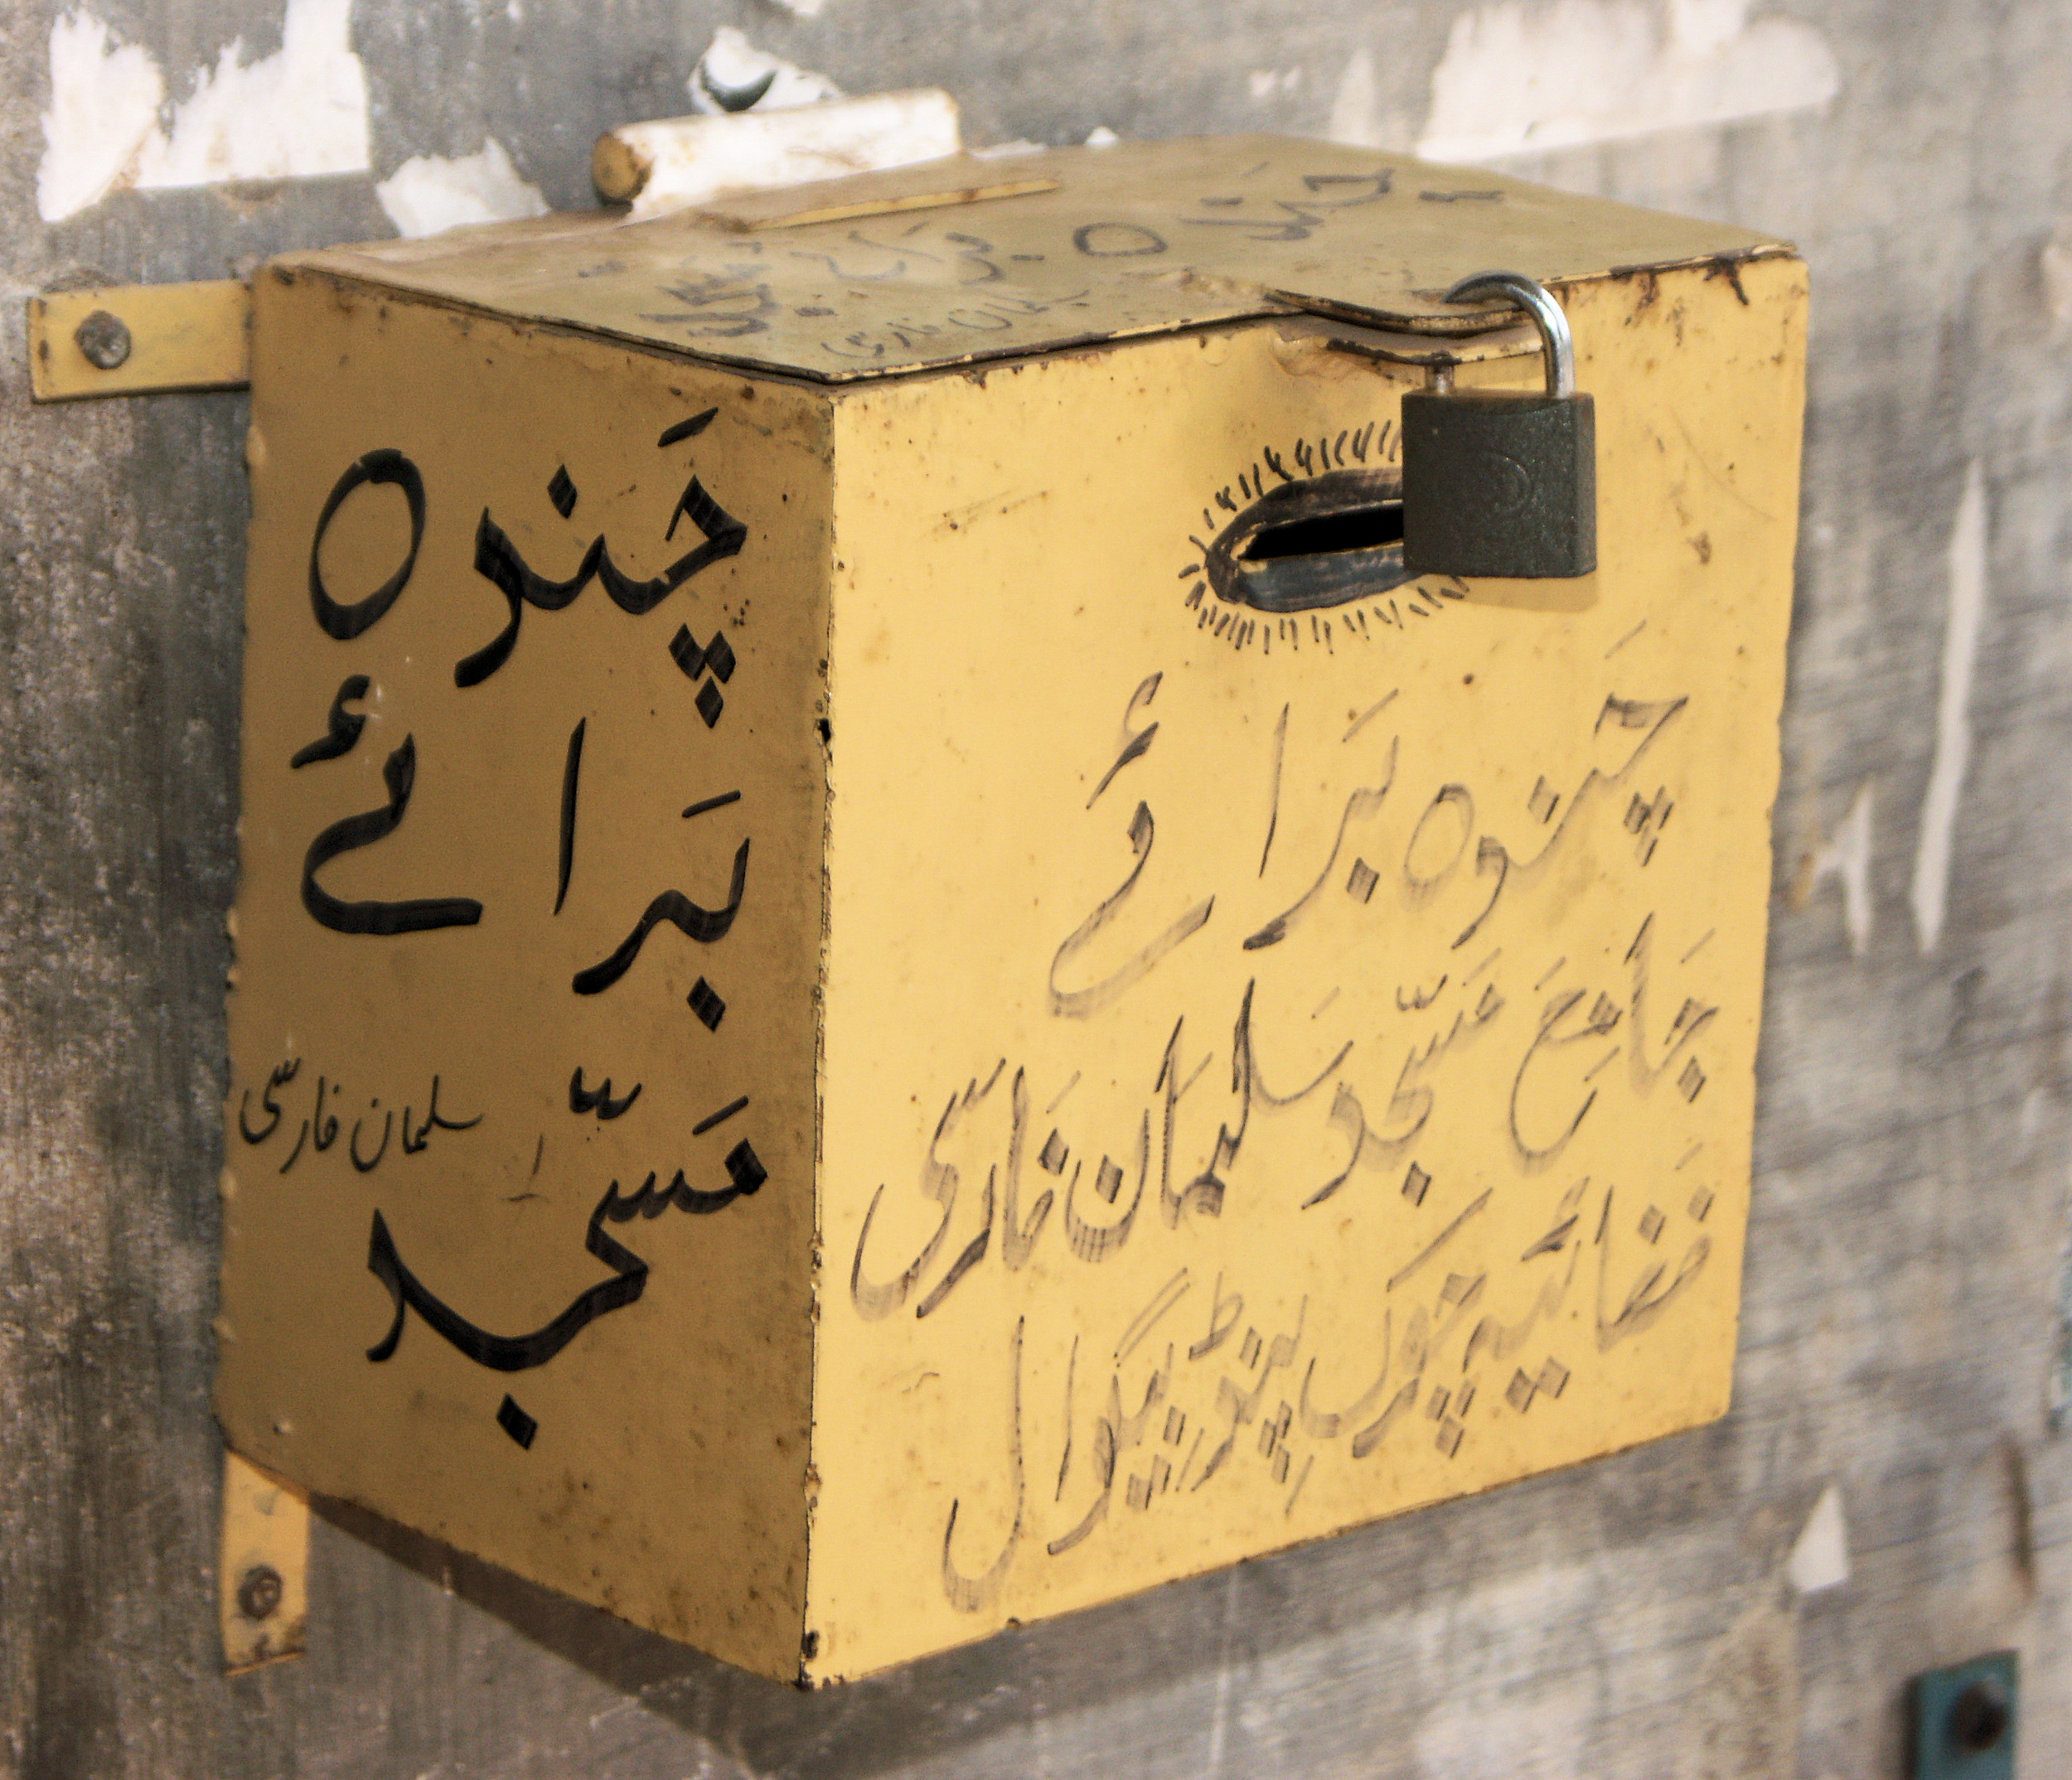 053 PB Mosque collection box.jpg